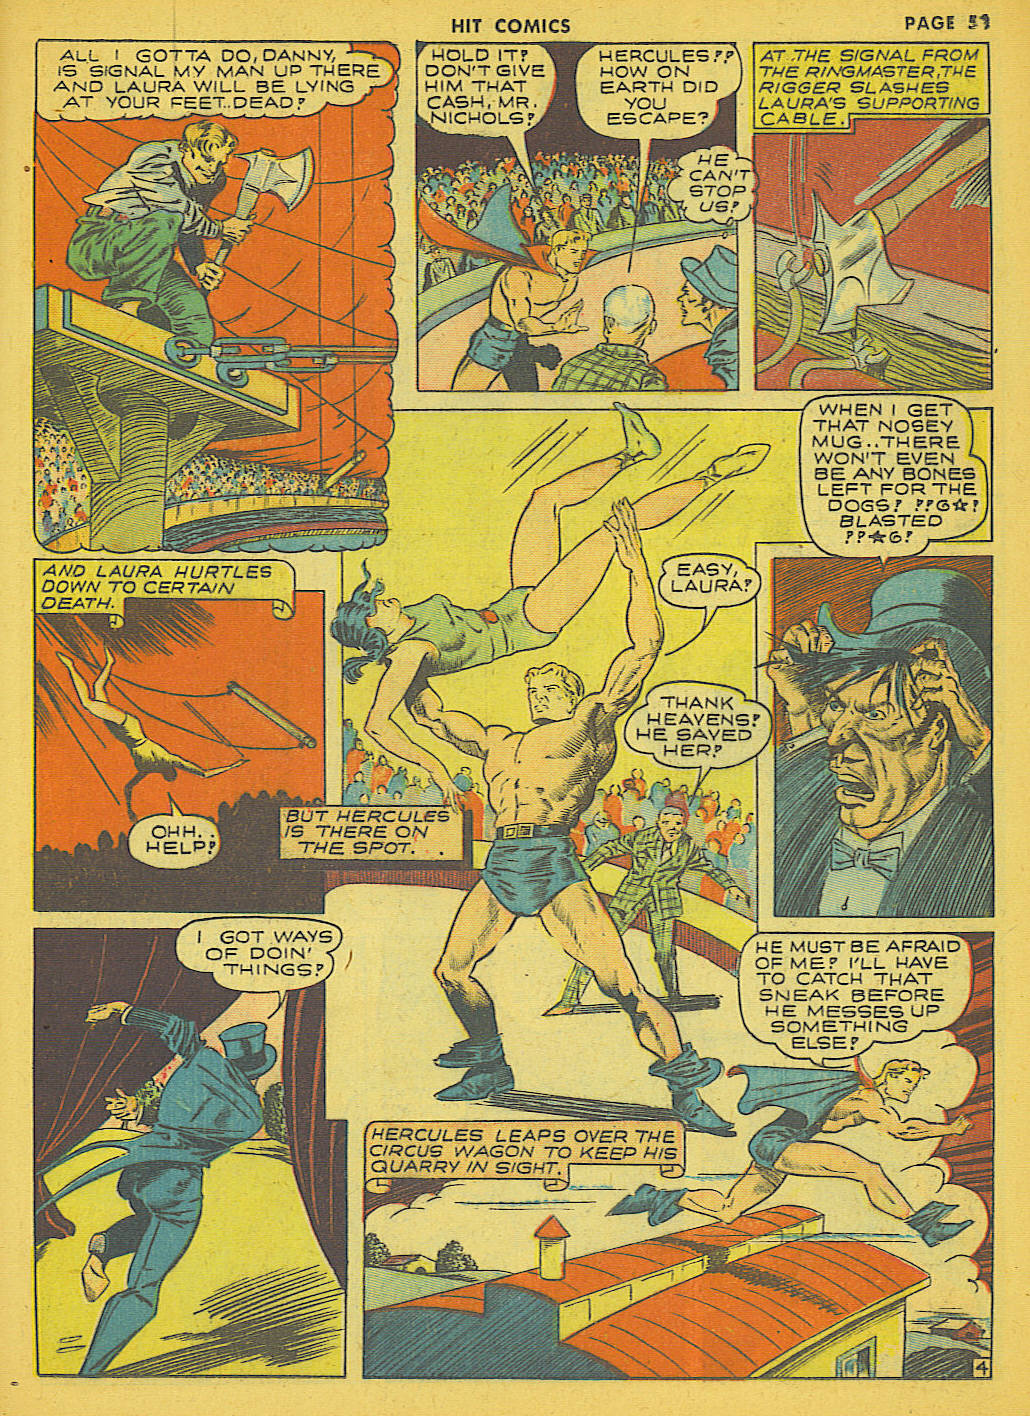 Read online Hit Comics comic -  Issue #21 - 55